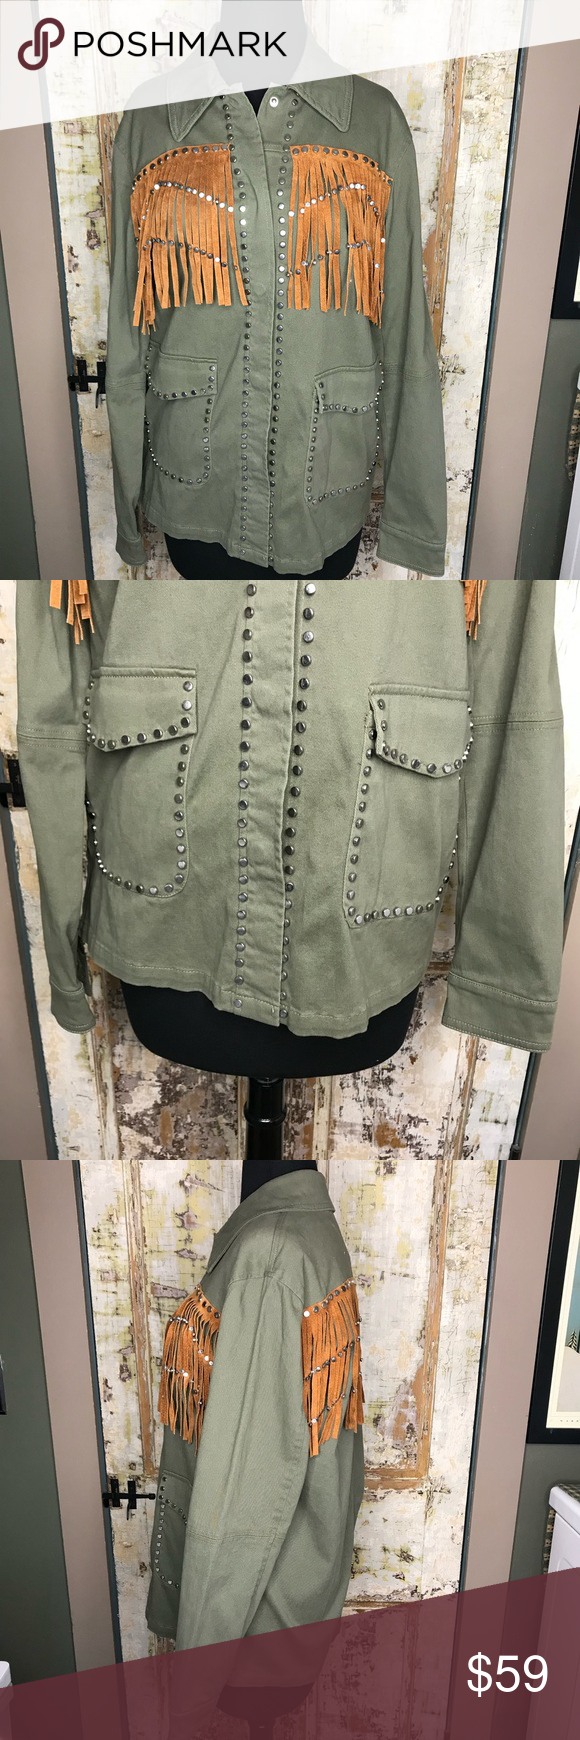 New Zara Outerwear Fringe Studded Army Jacket Army Jacket Military Jacket Green Jackets [ 1740 x 580 Pixel ]